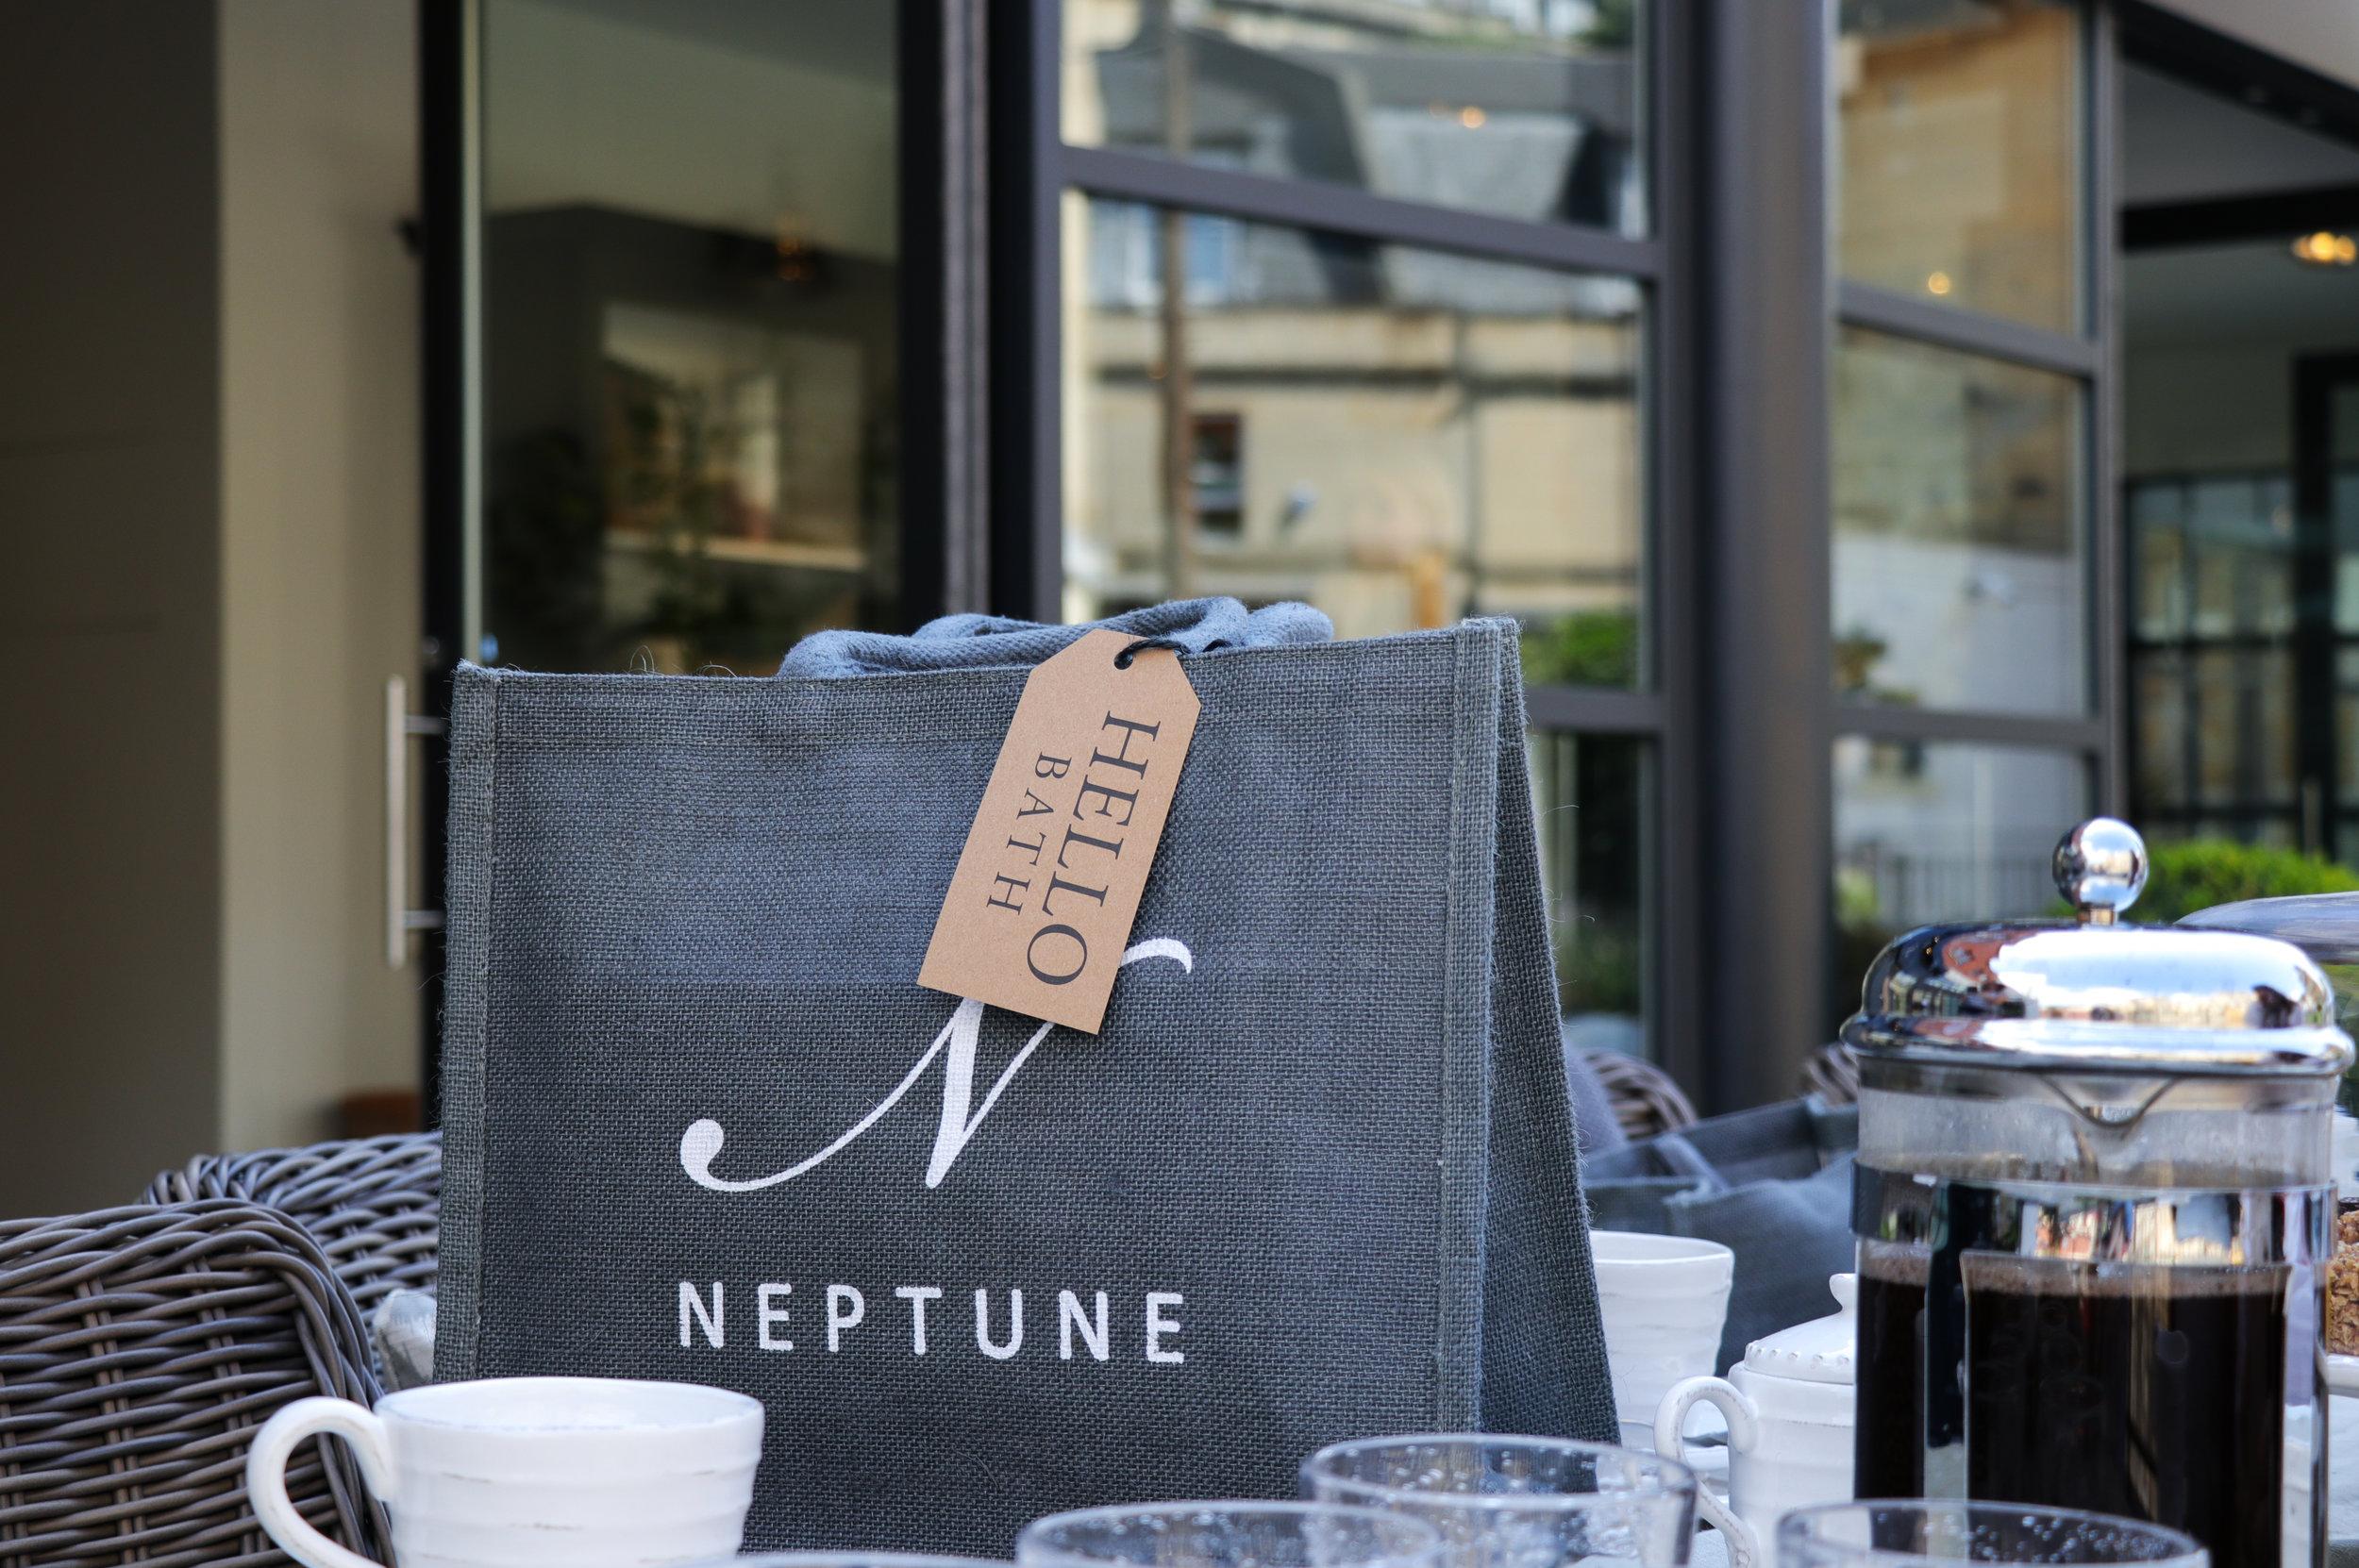 Neptune - Bath.jpg